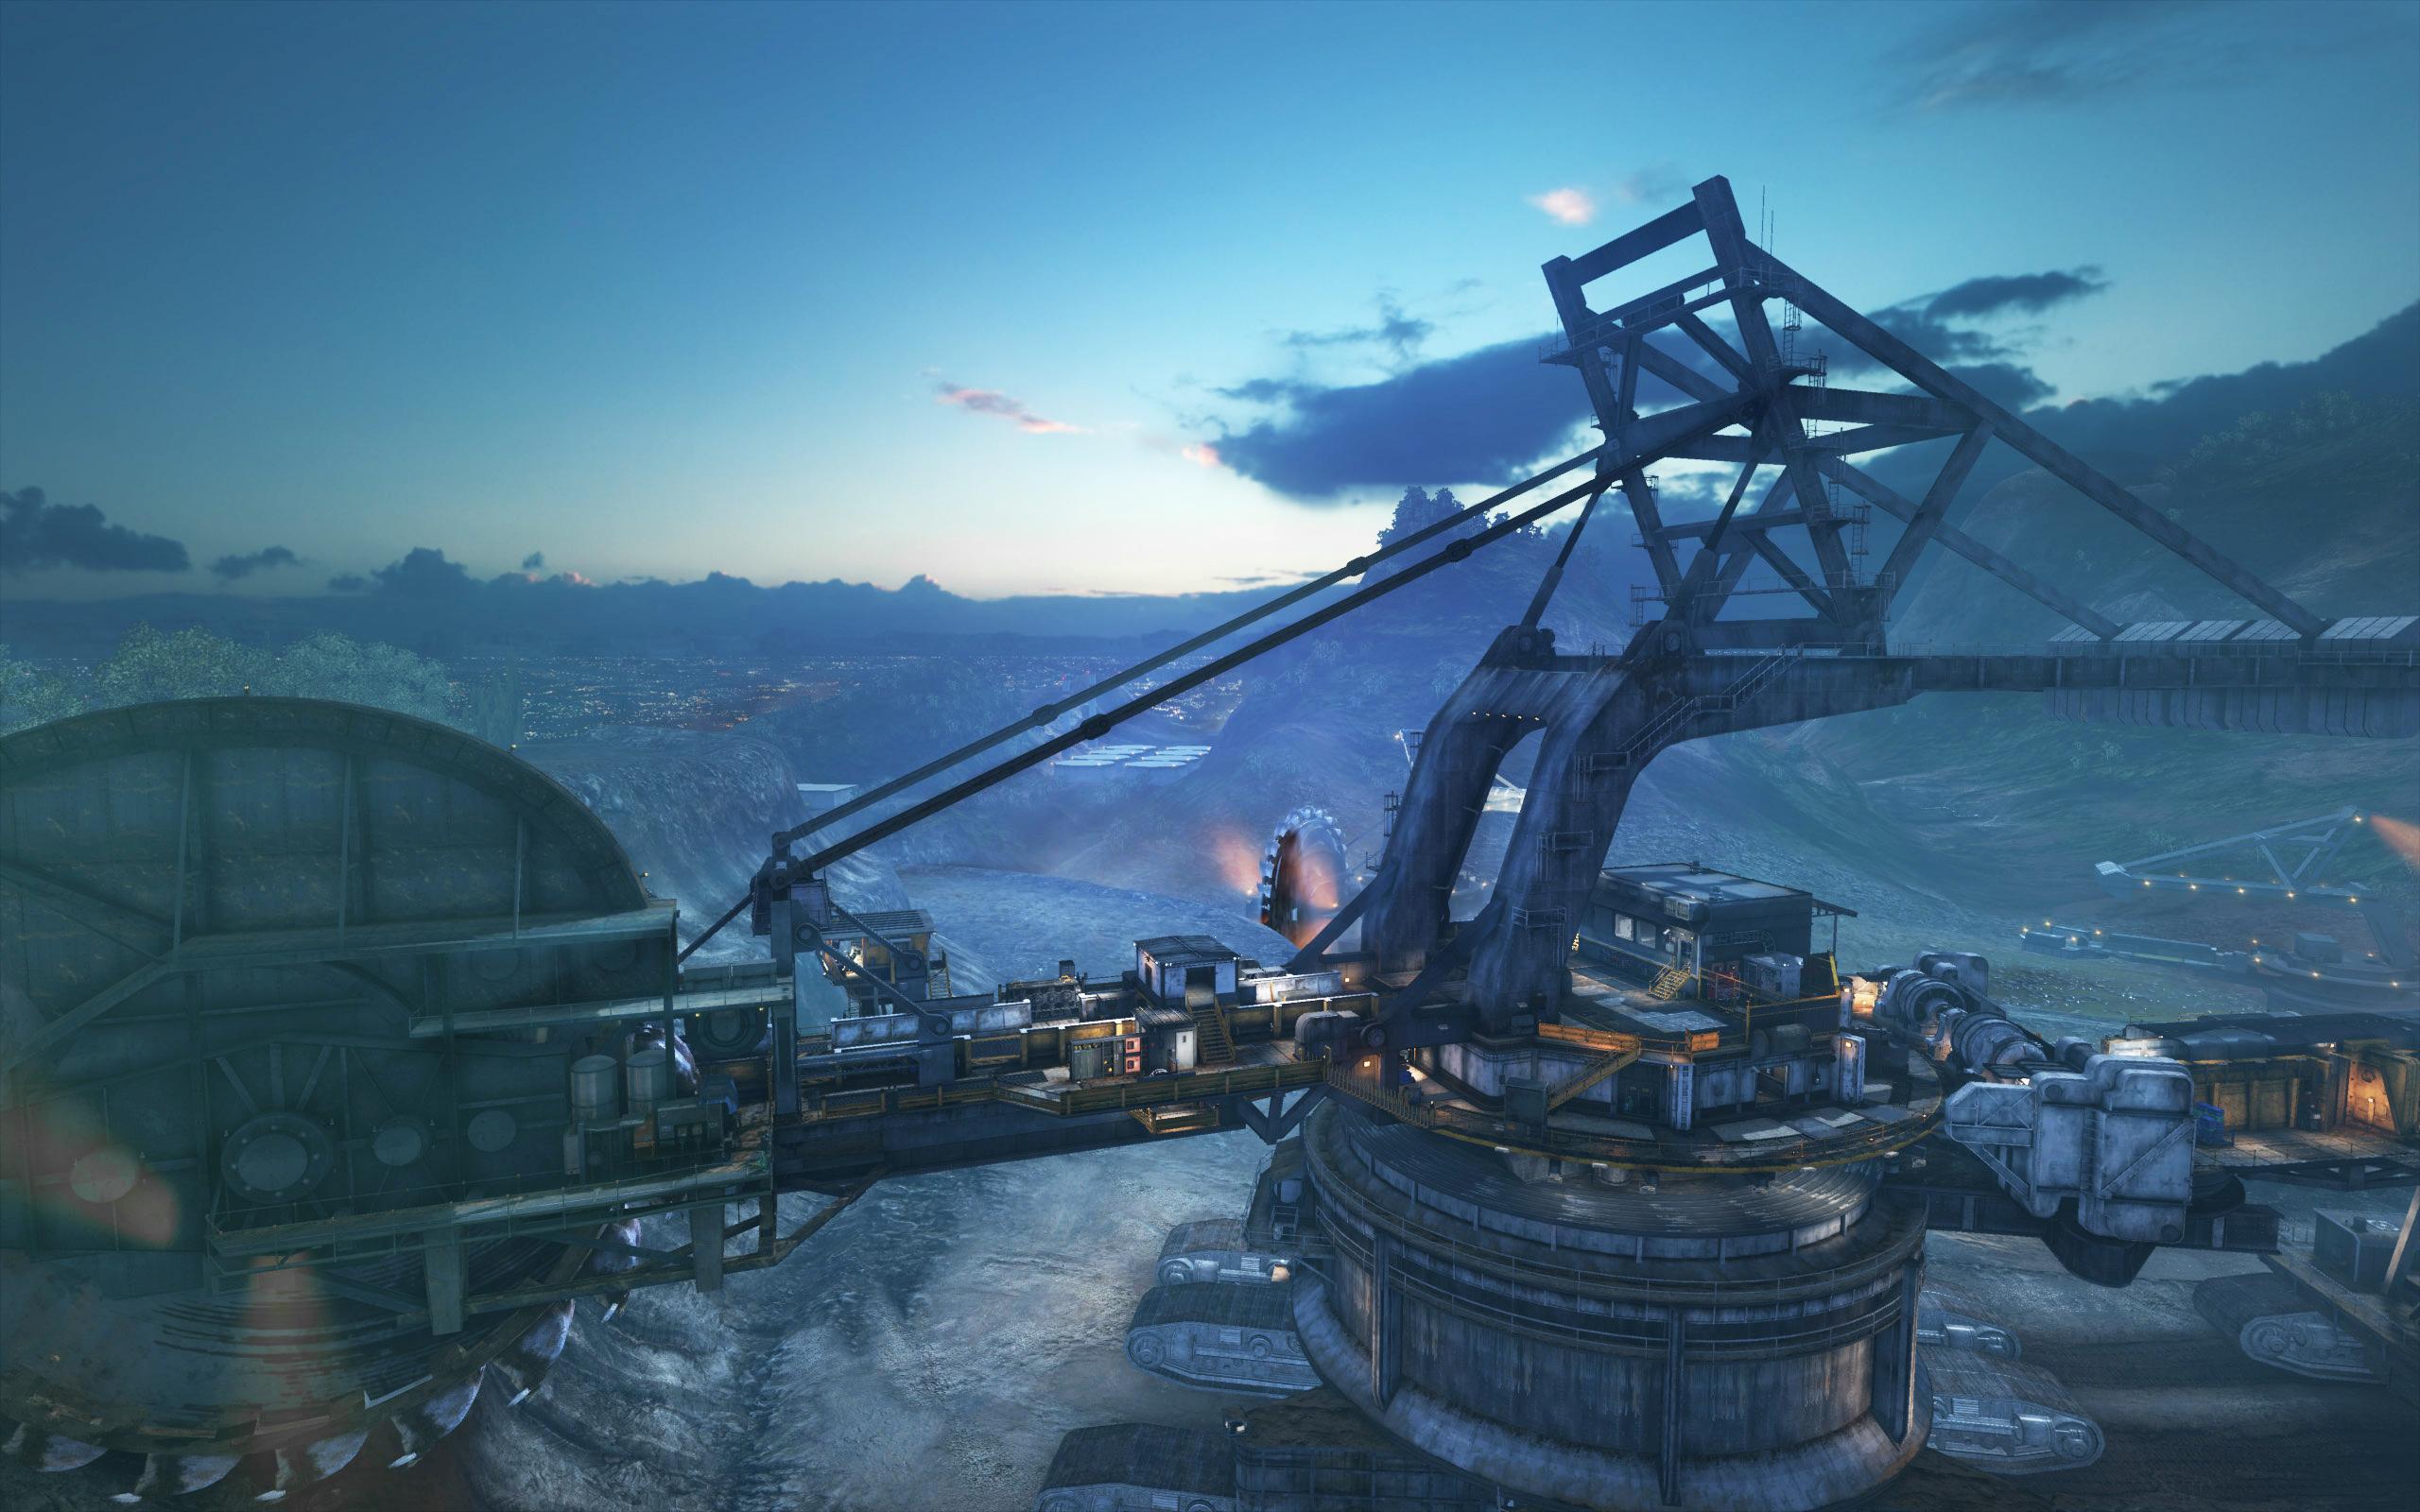 New Trailer Call Of Duty Ghosts Devastation Dlc Negaming